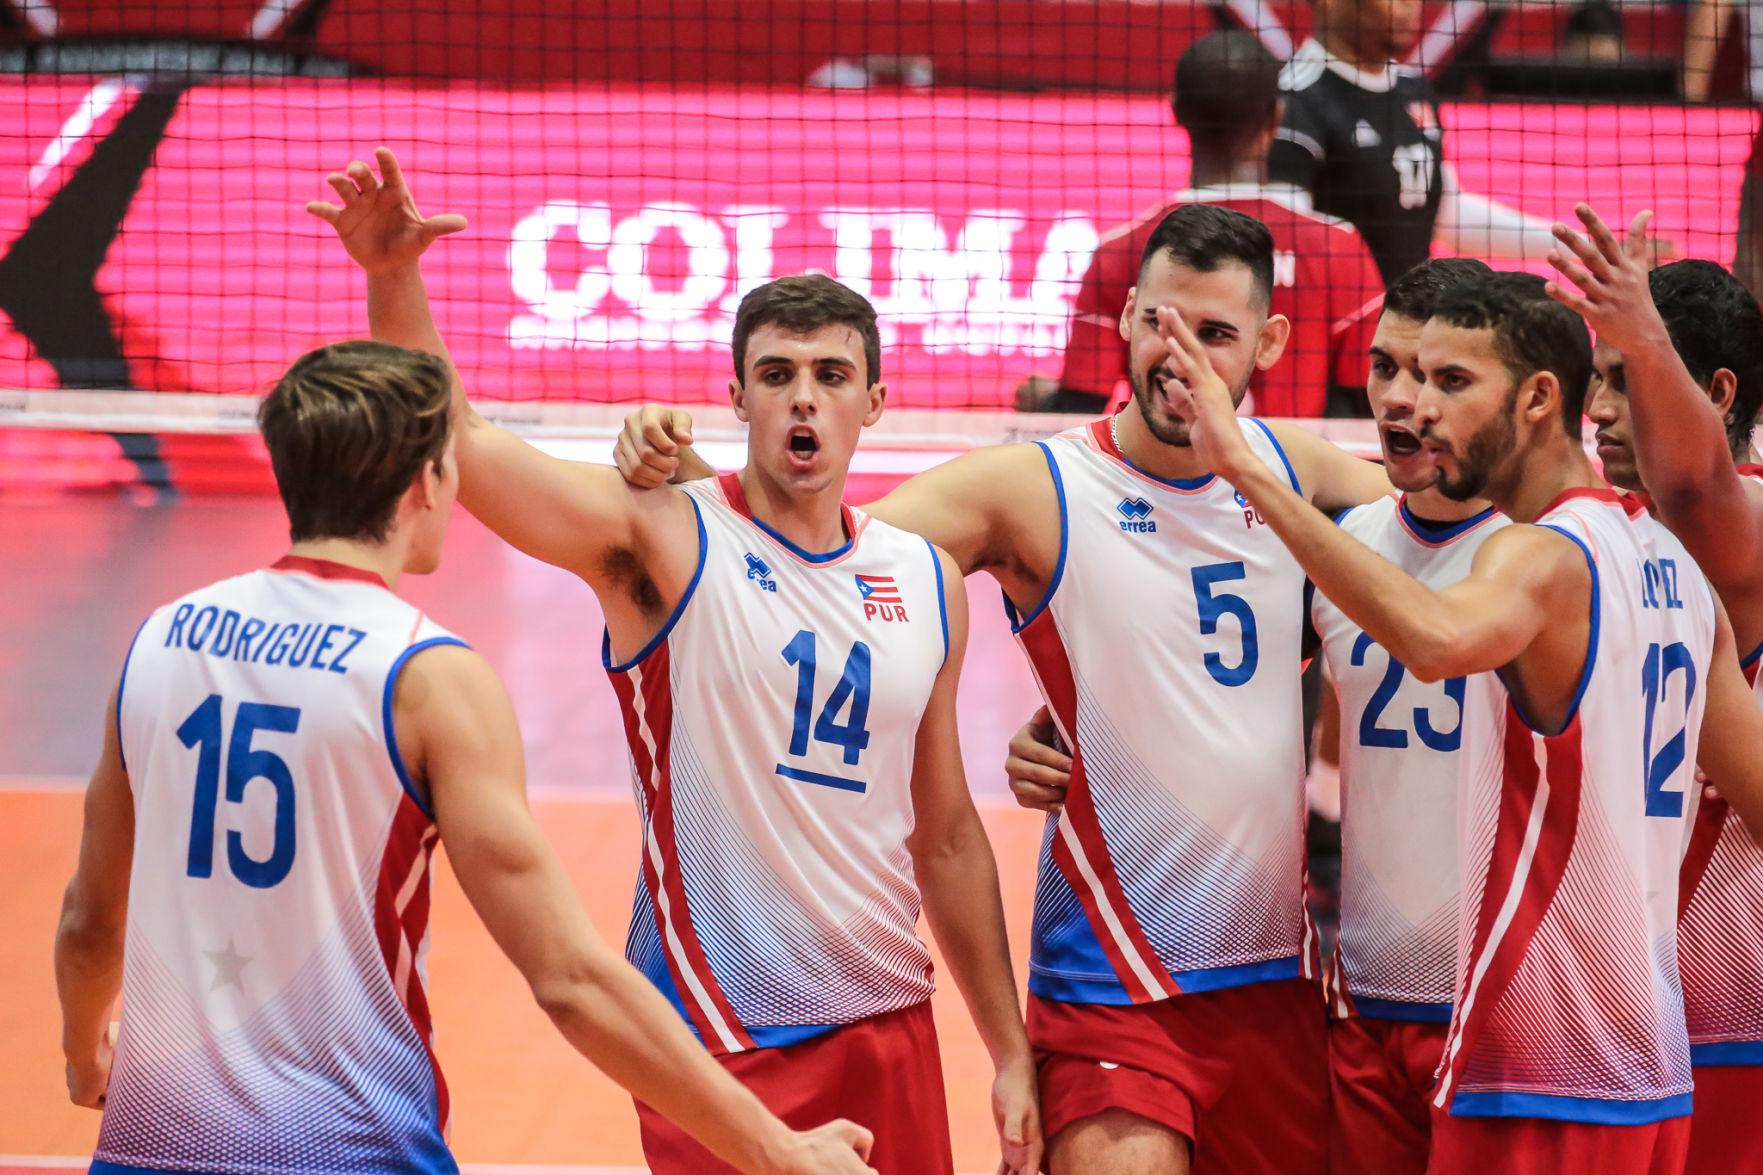 Lista la preselección nacional masculina de voleibol